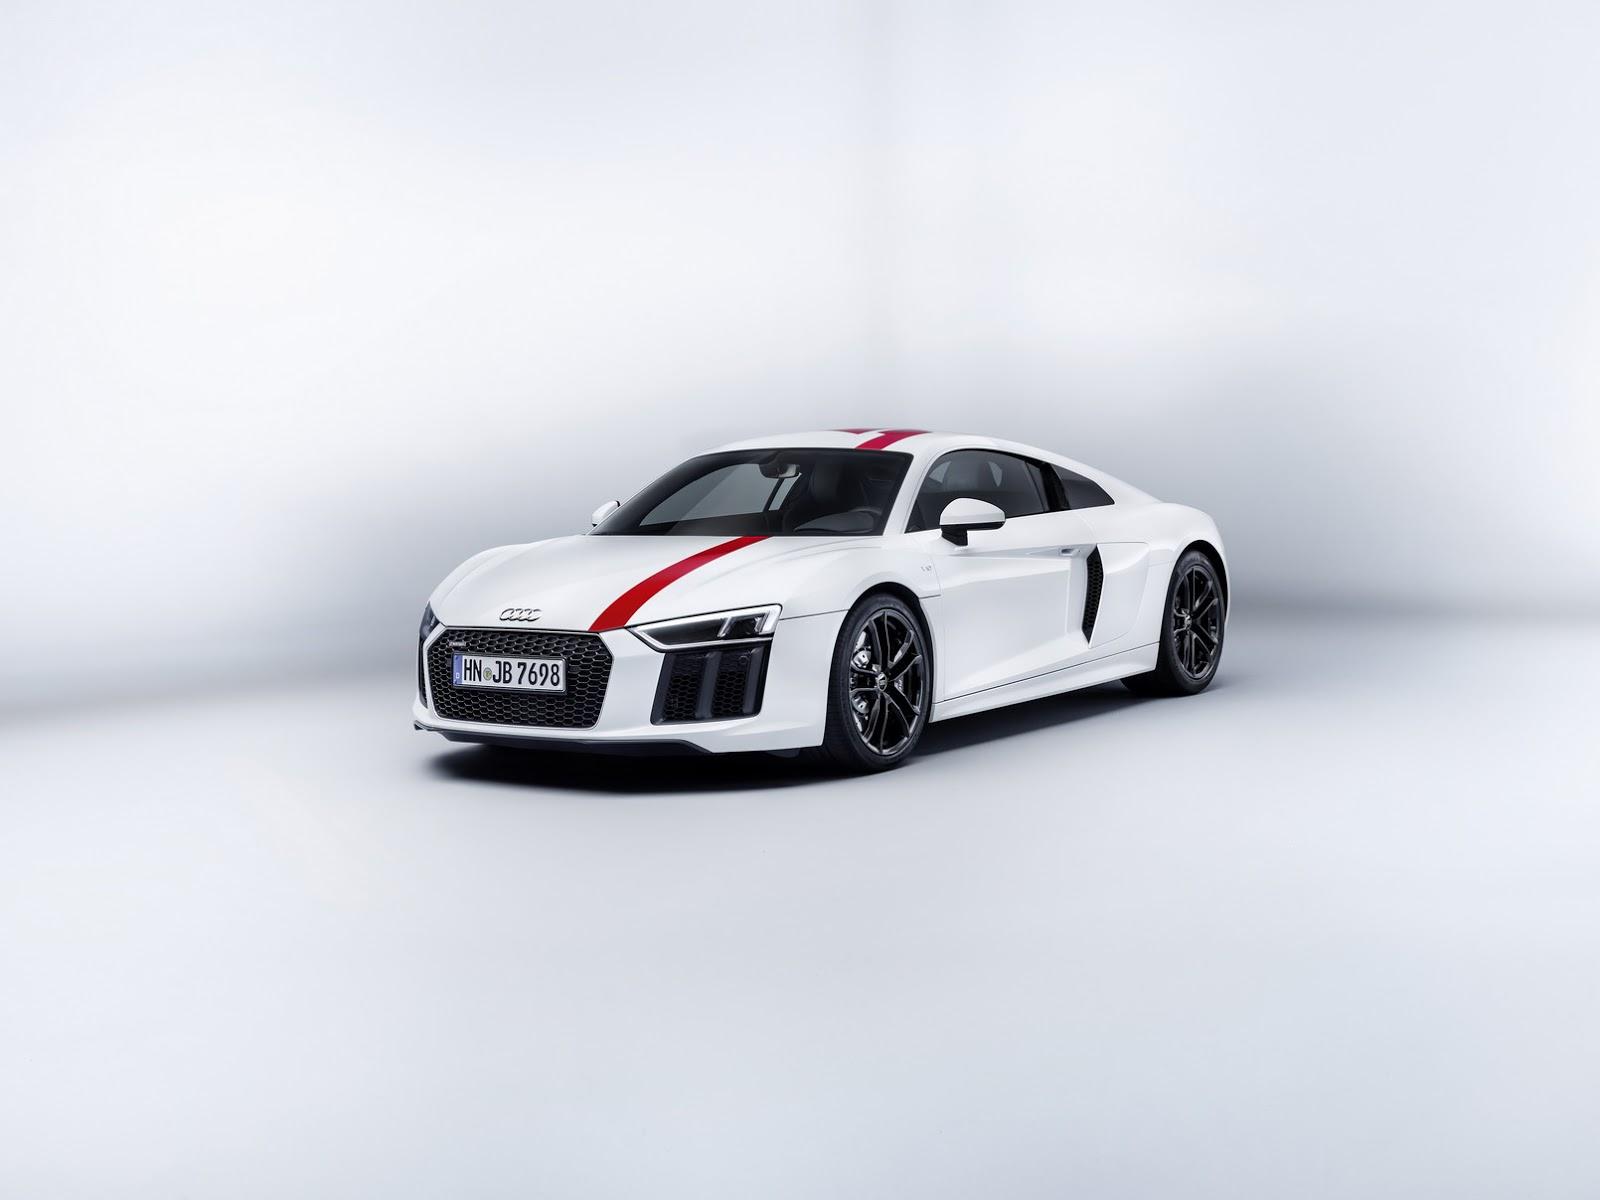 2018_Audi_R8_V10_RWS_62